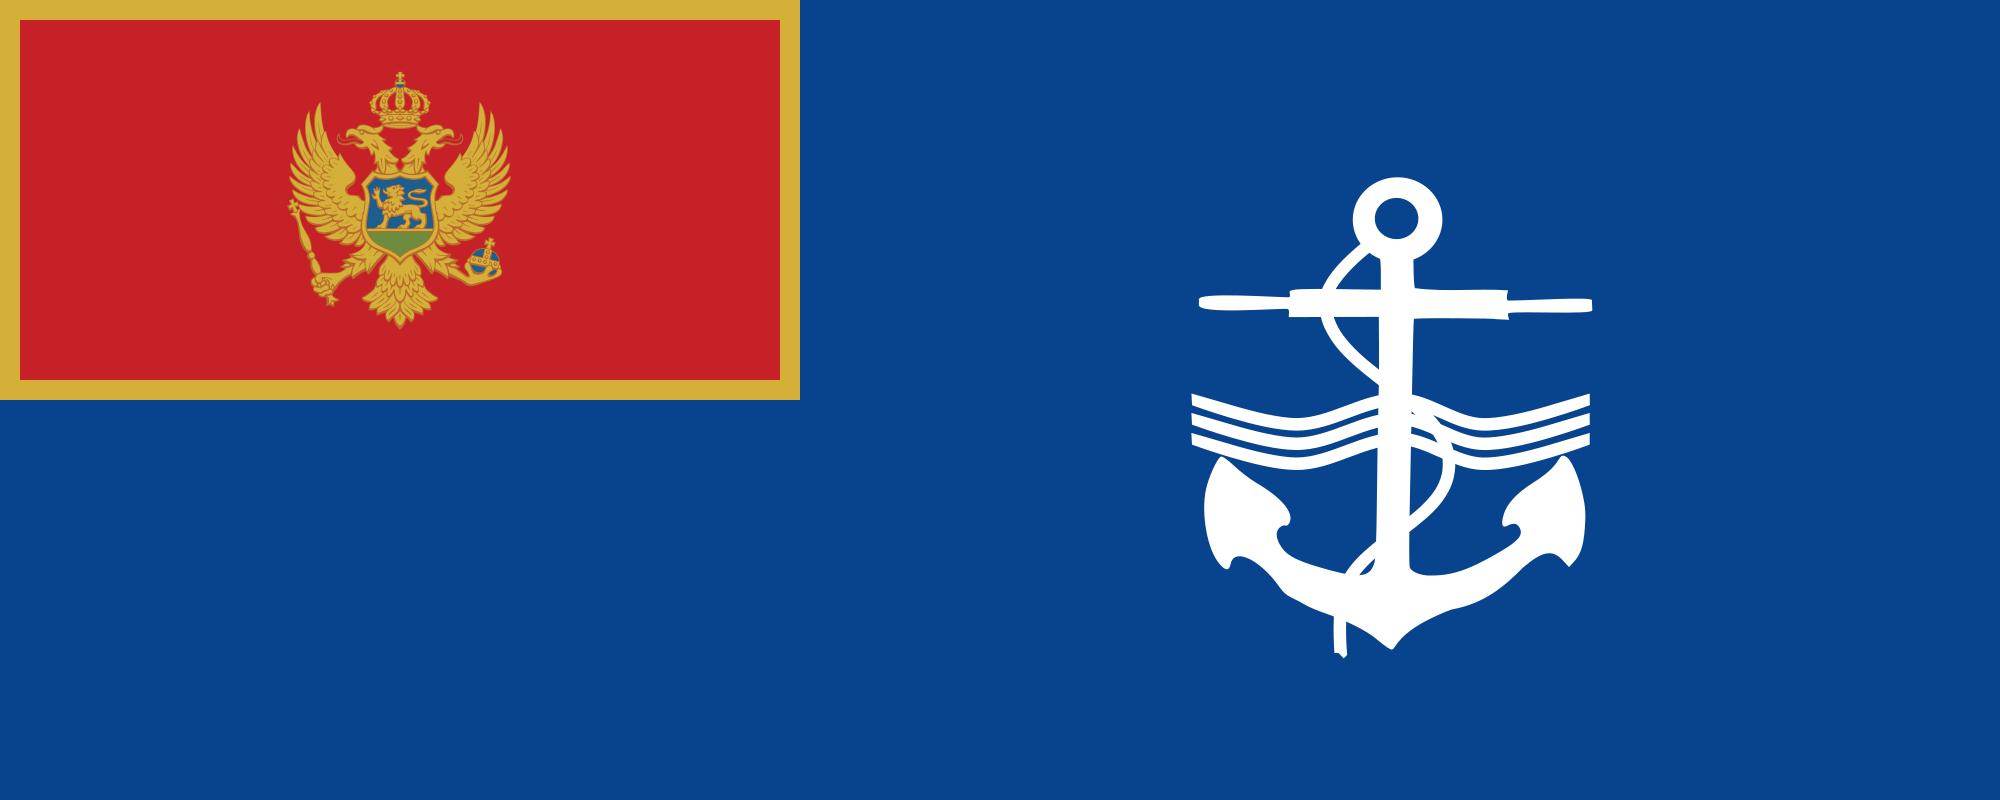 Montenegro (Naval ensign)